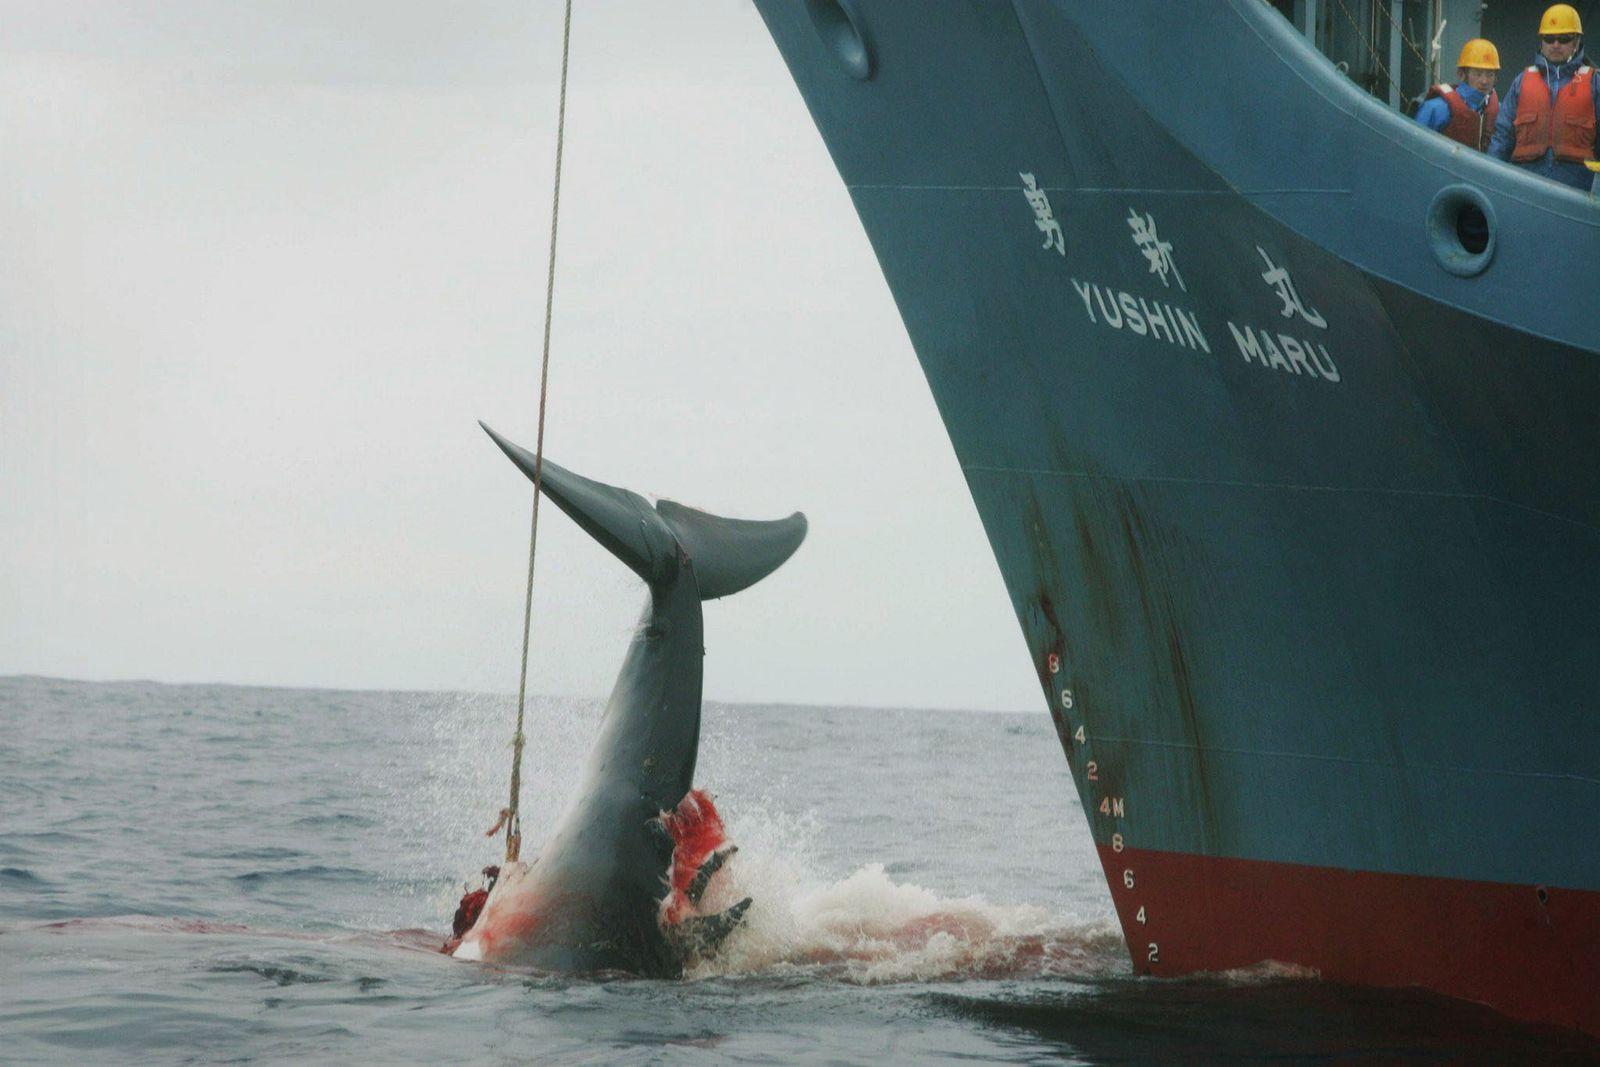 Japanischer WalfängerWalfang/ Japan/ Antarktis/ Wiederaufnahme